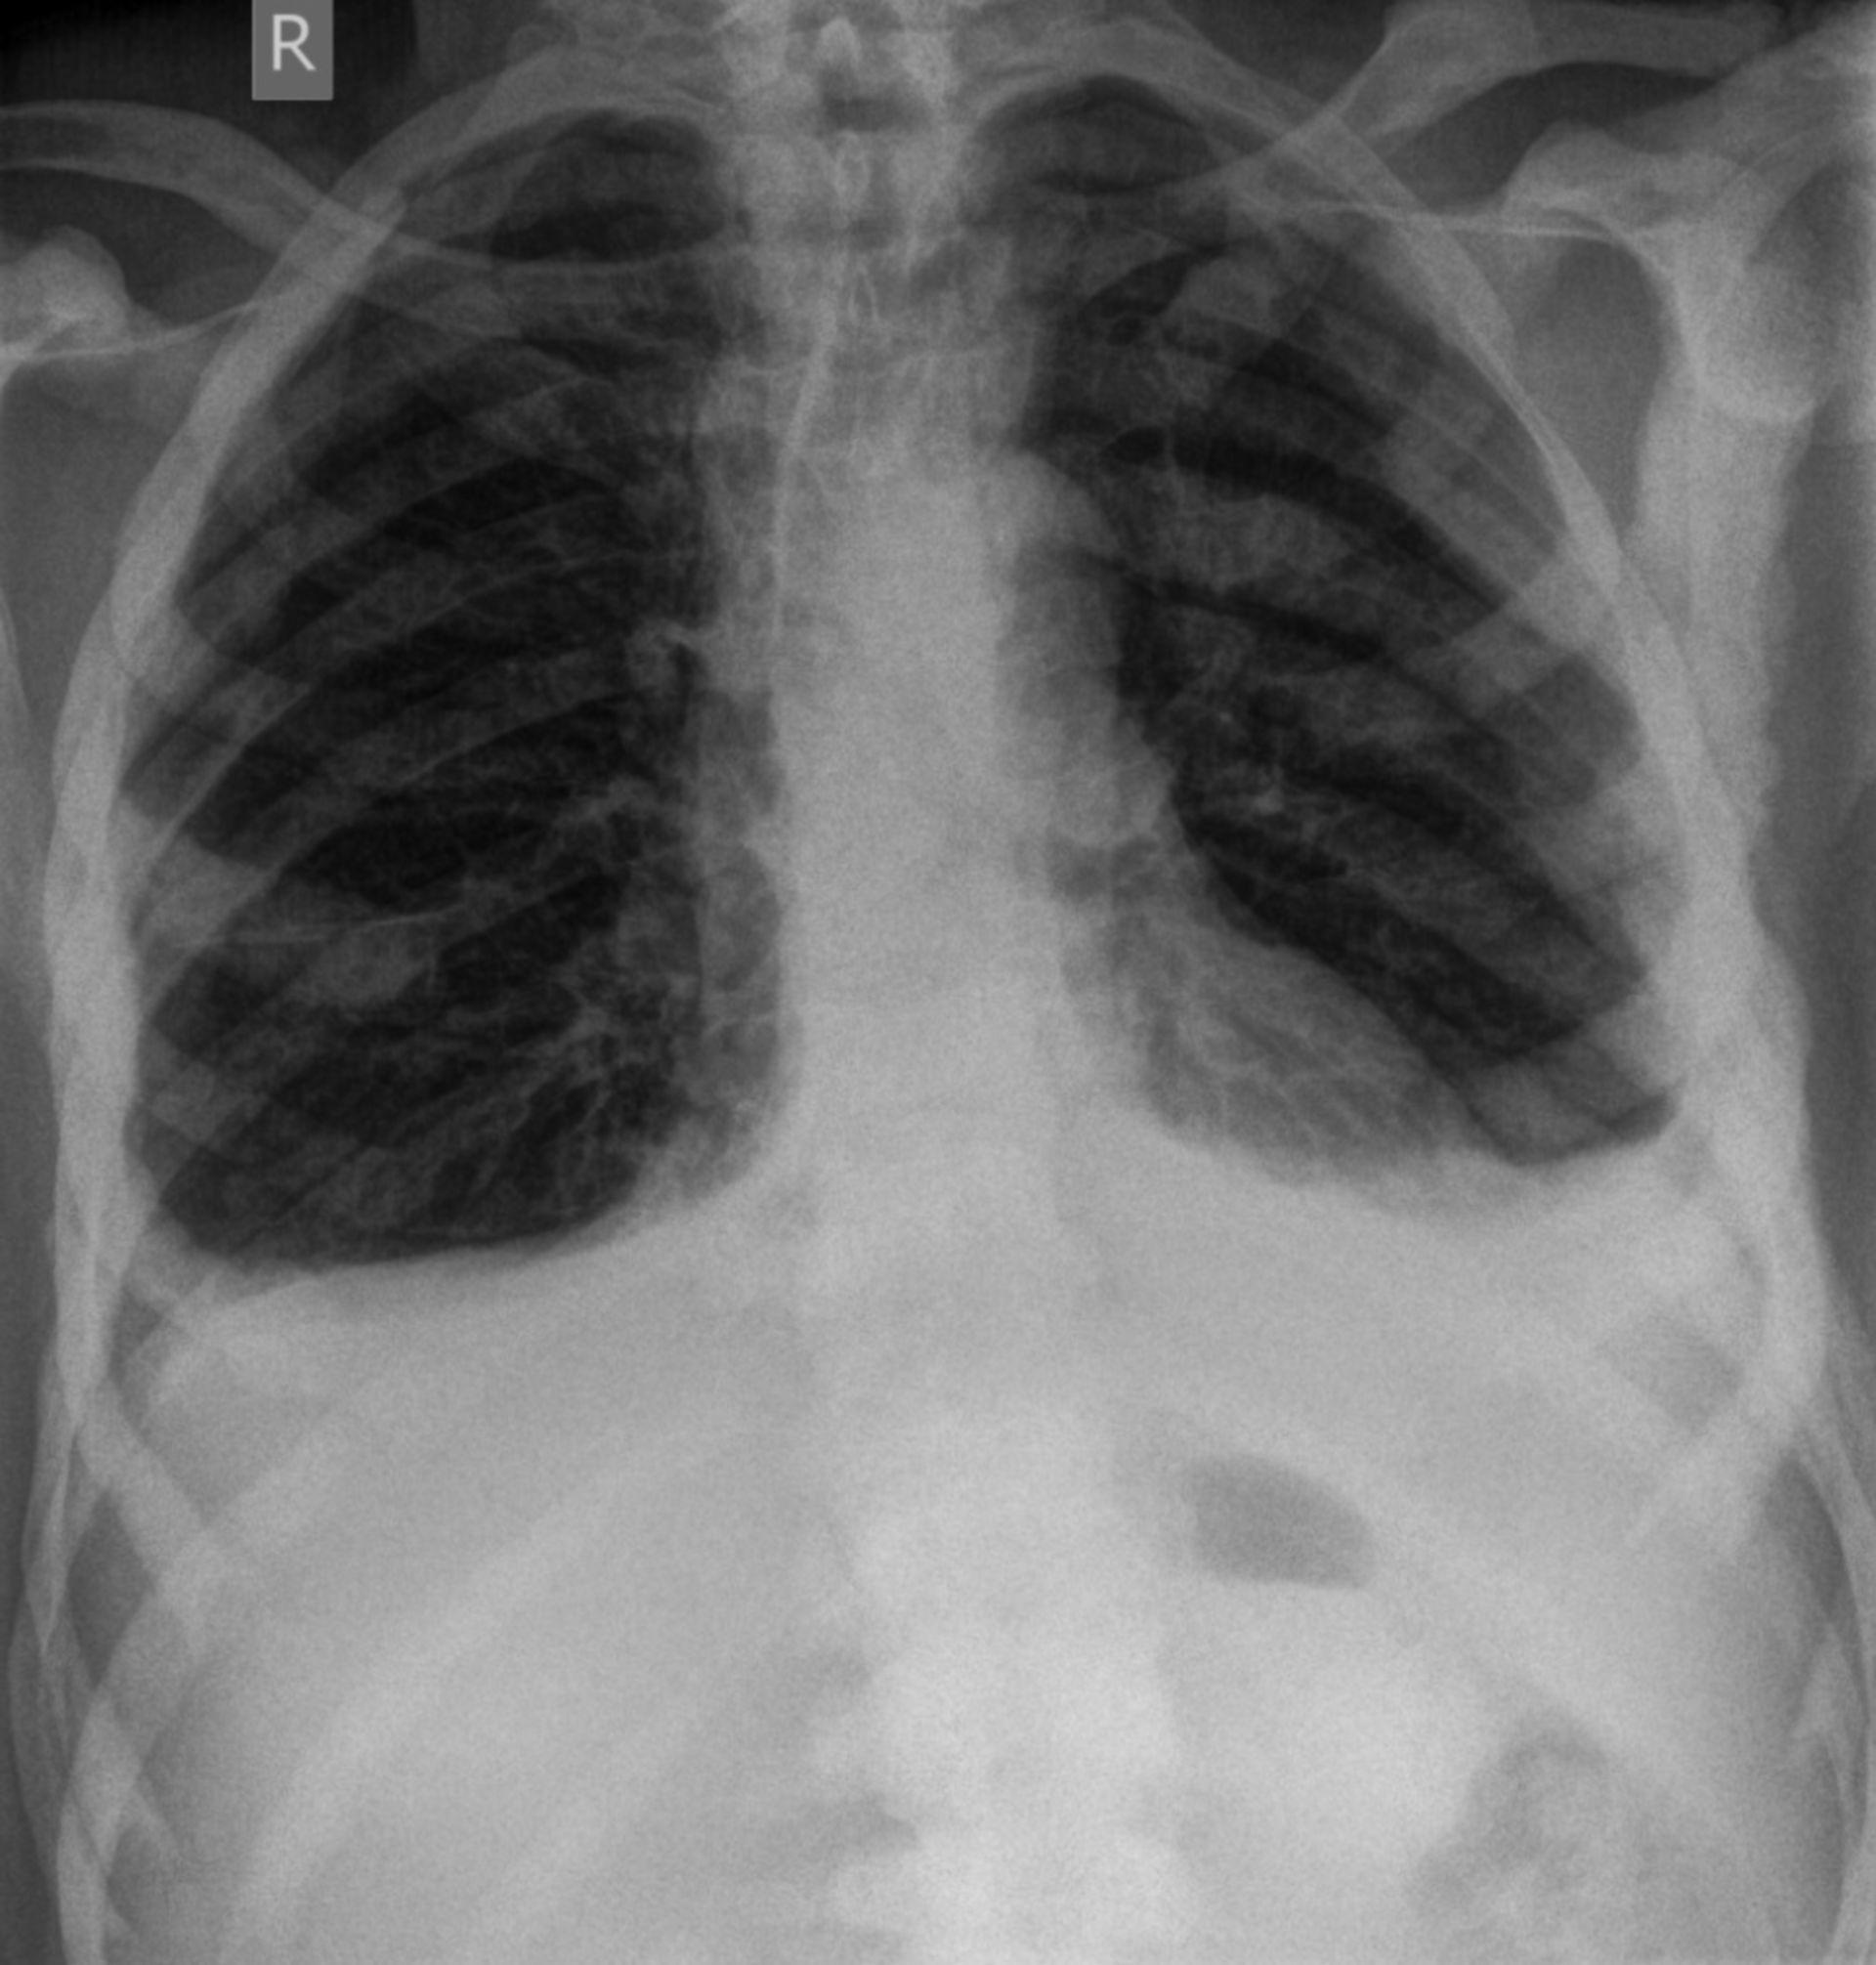 Prostata-Ca - ossäre Thoraxmetastasen